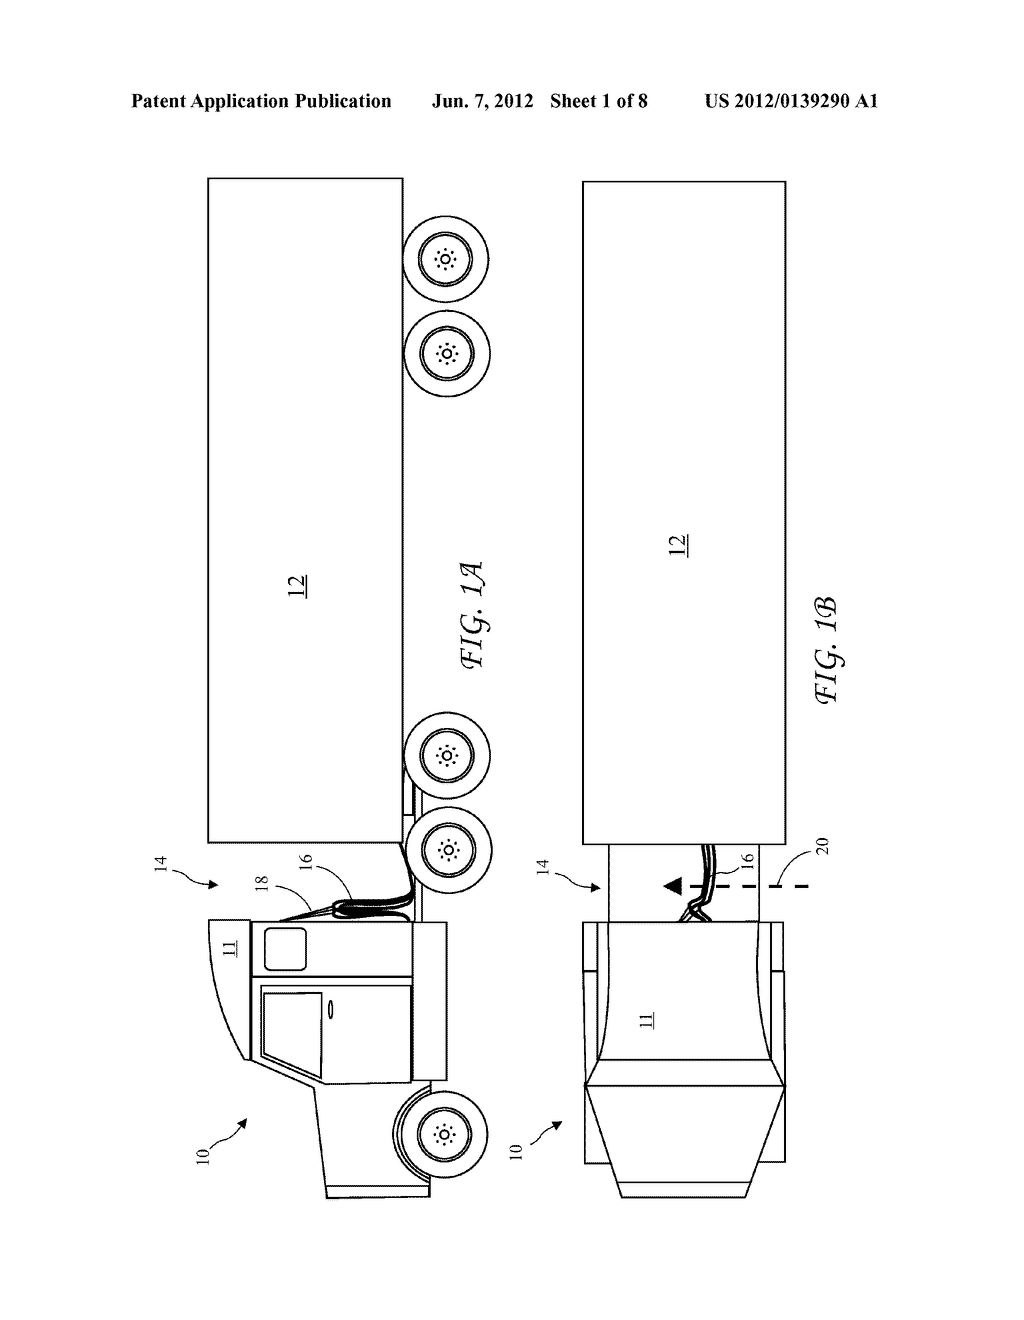 Tractor trailer cross wind blocker diagram schematic and image 02 rh patentsencyclopedia semi tractor diagram semi tractor trailer diagram